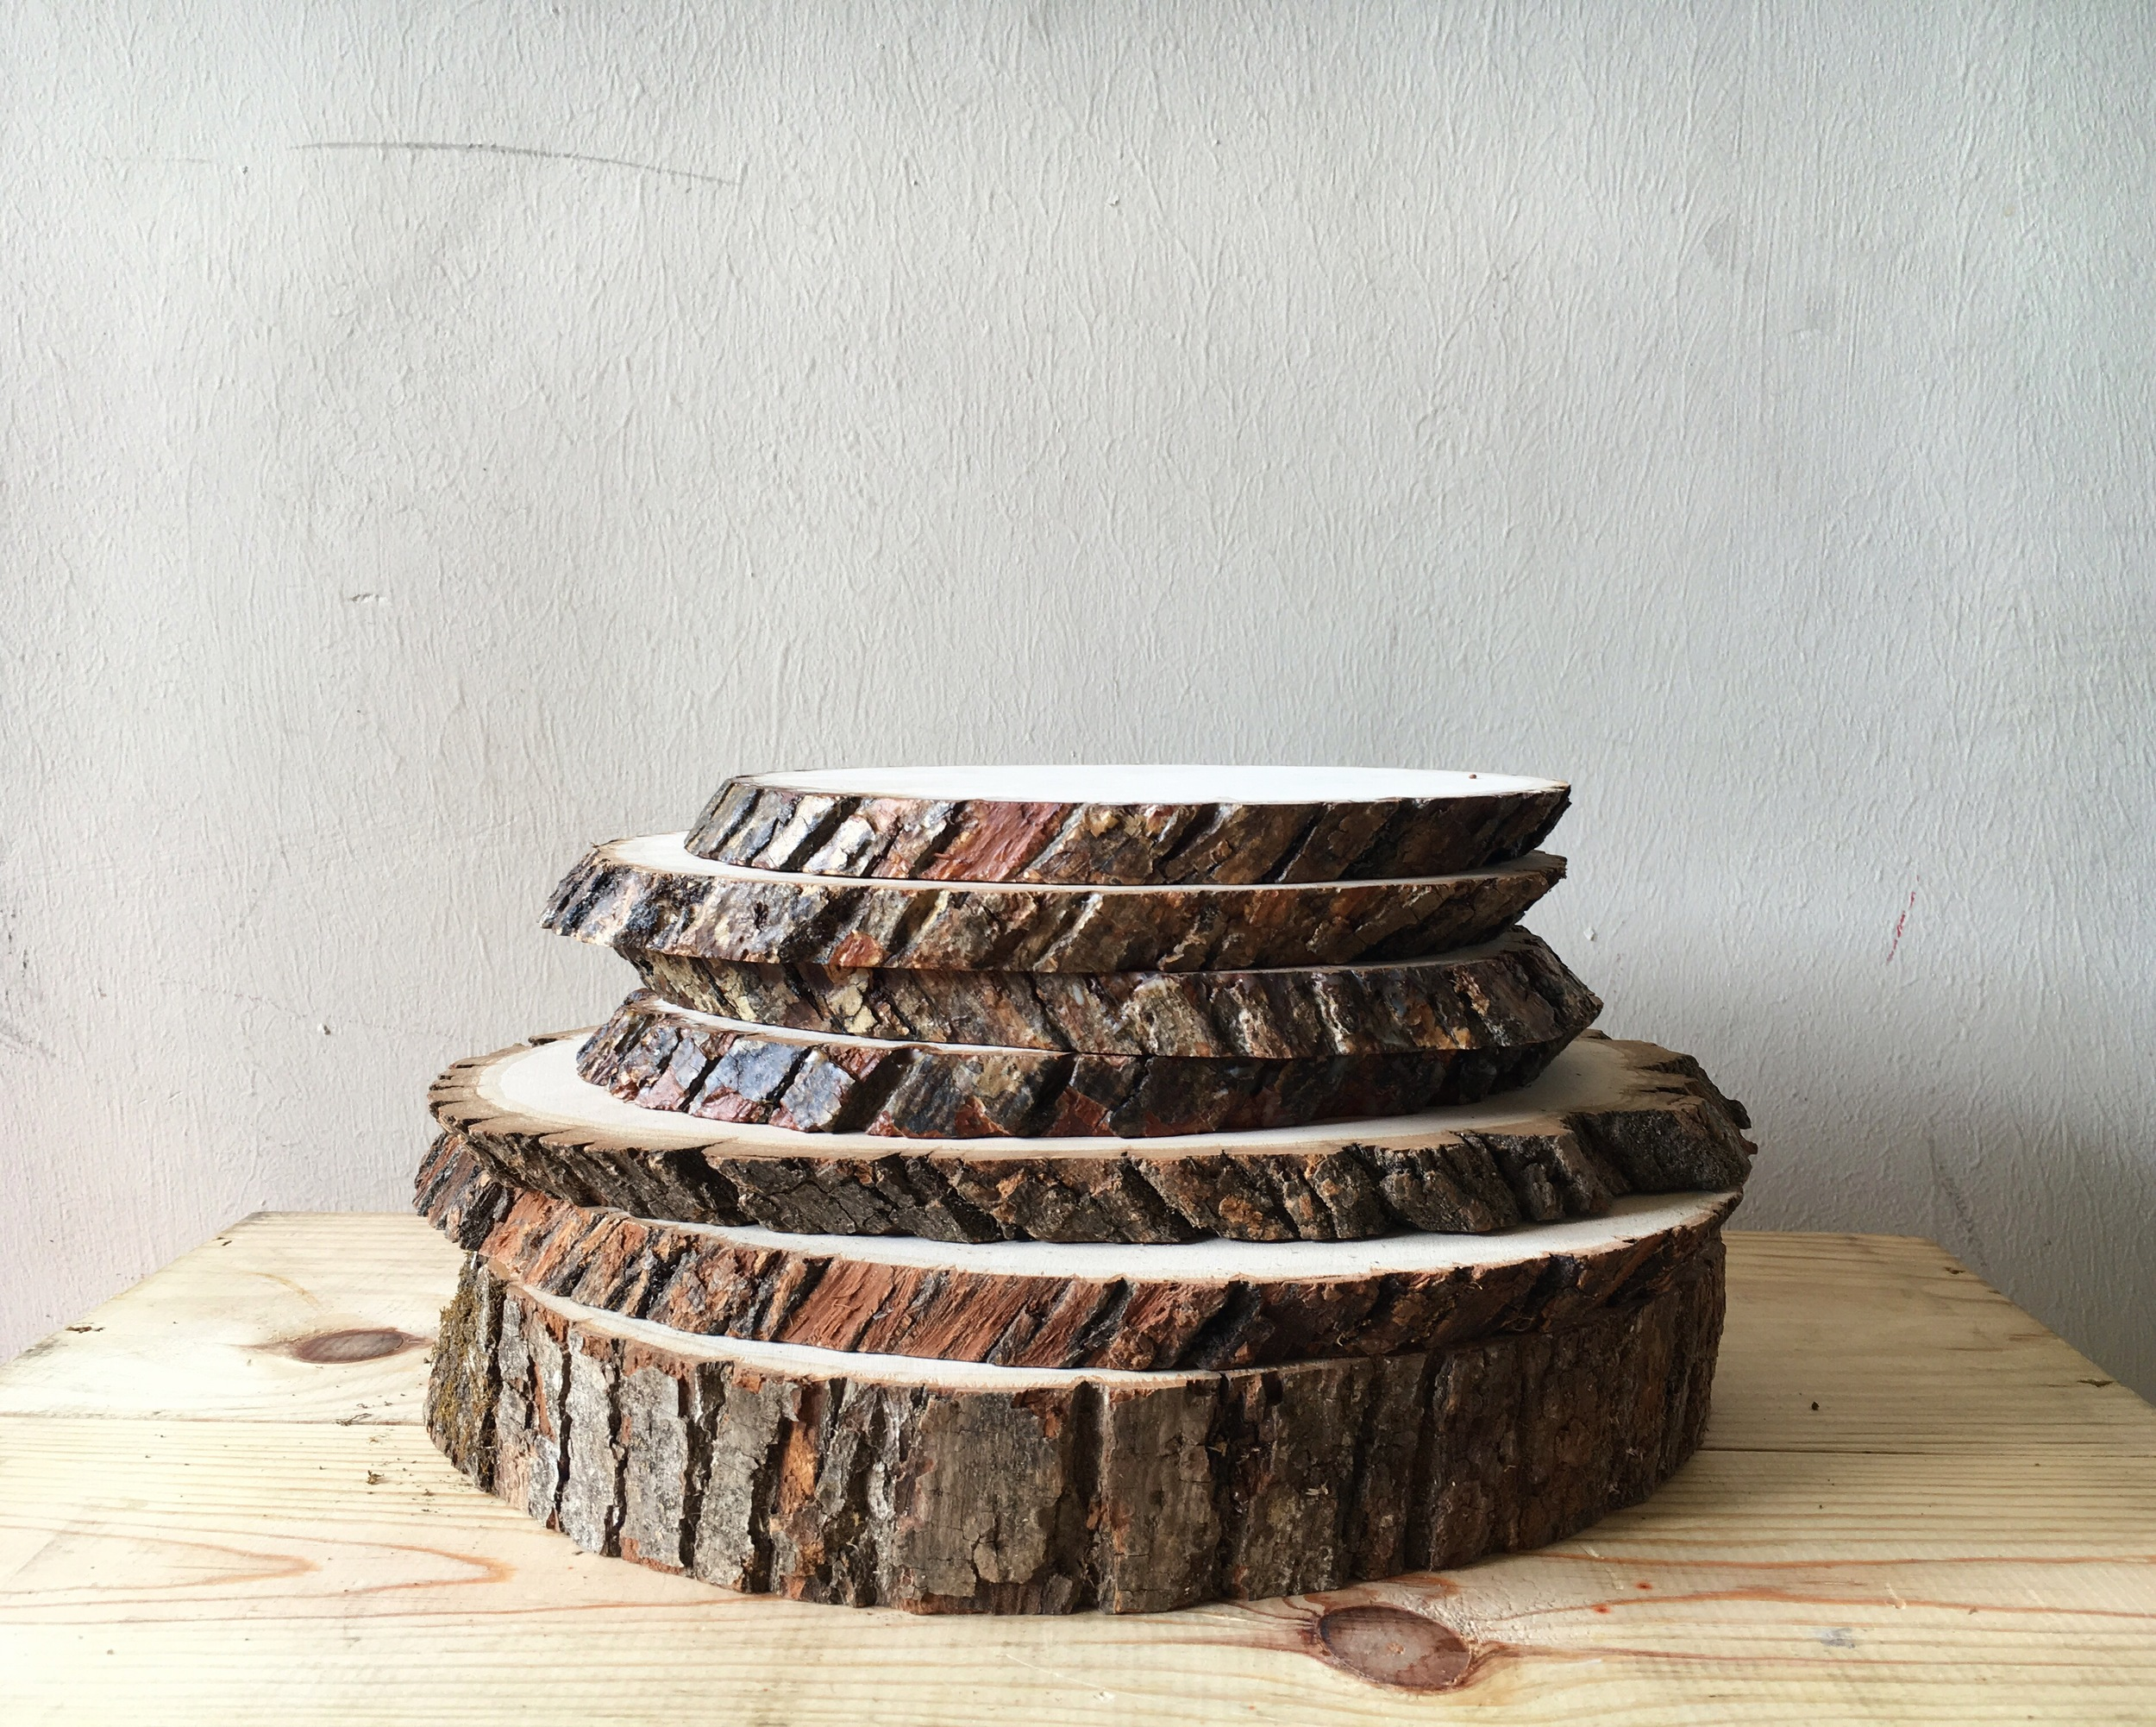 DT06 Wood Slices